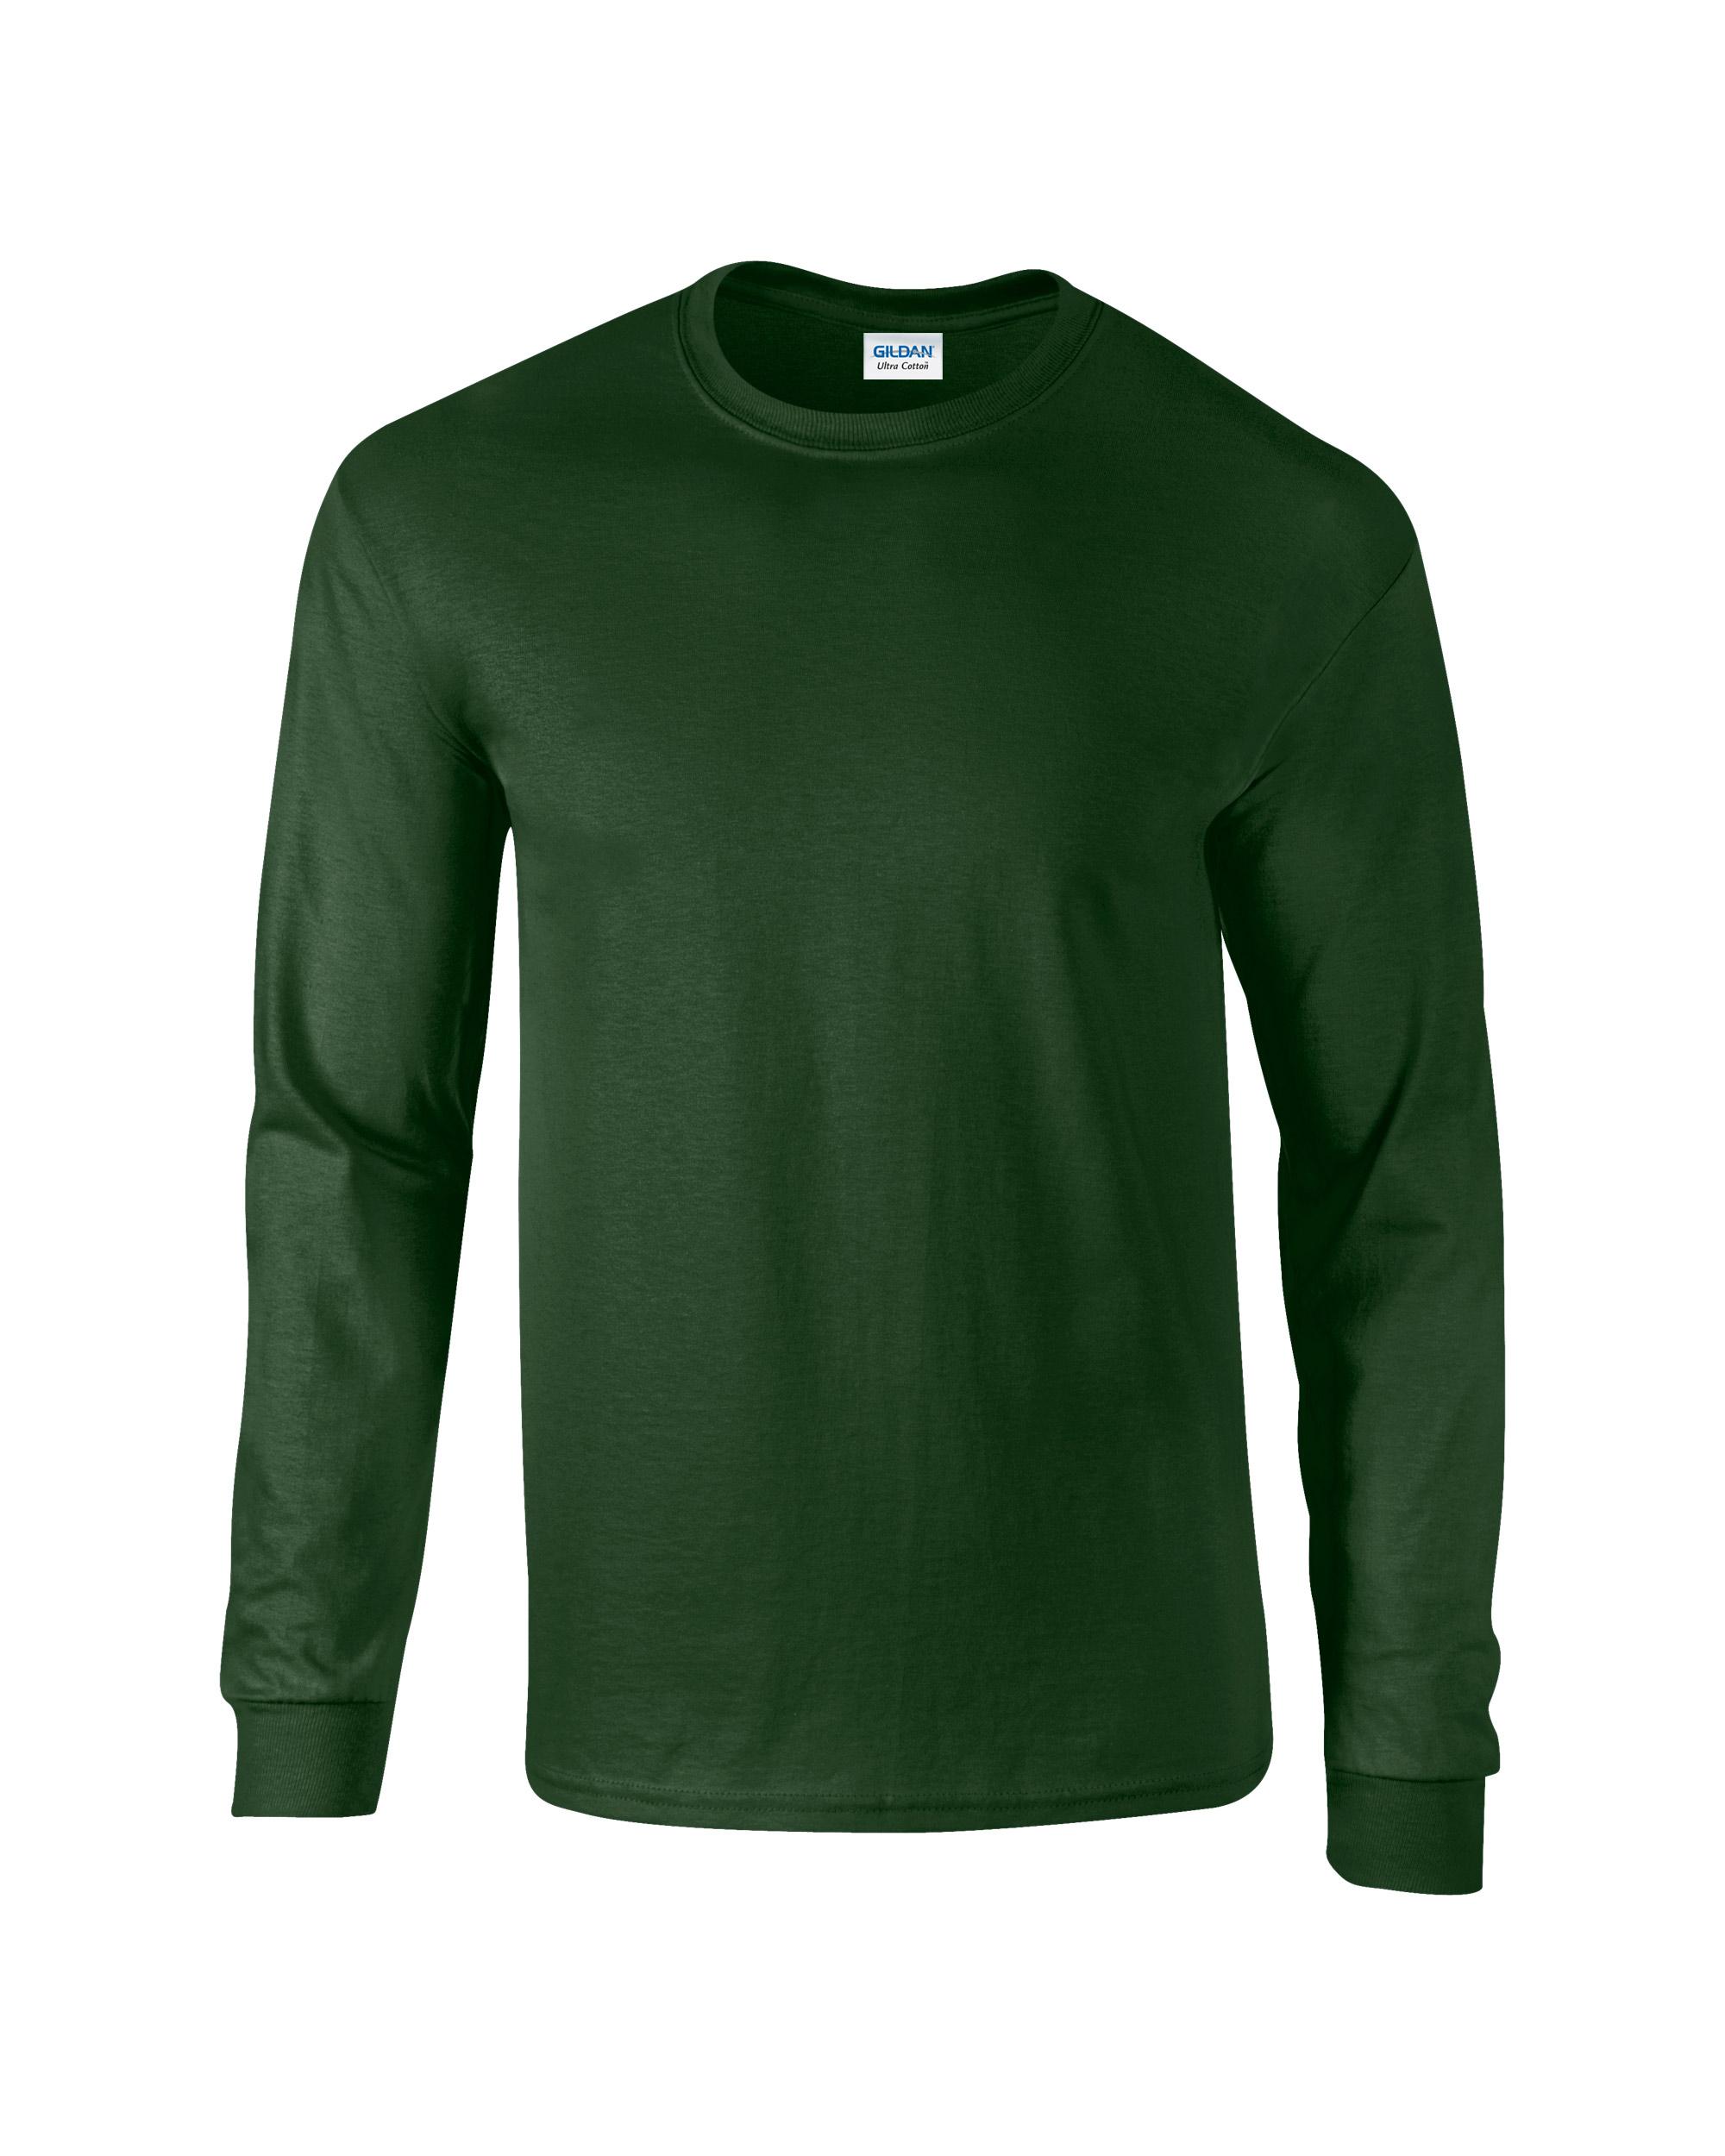 Safety Green Tee Shirts